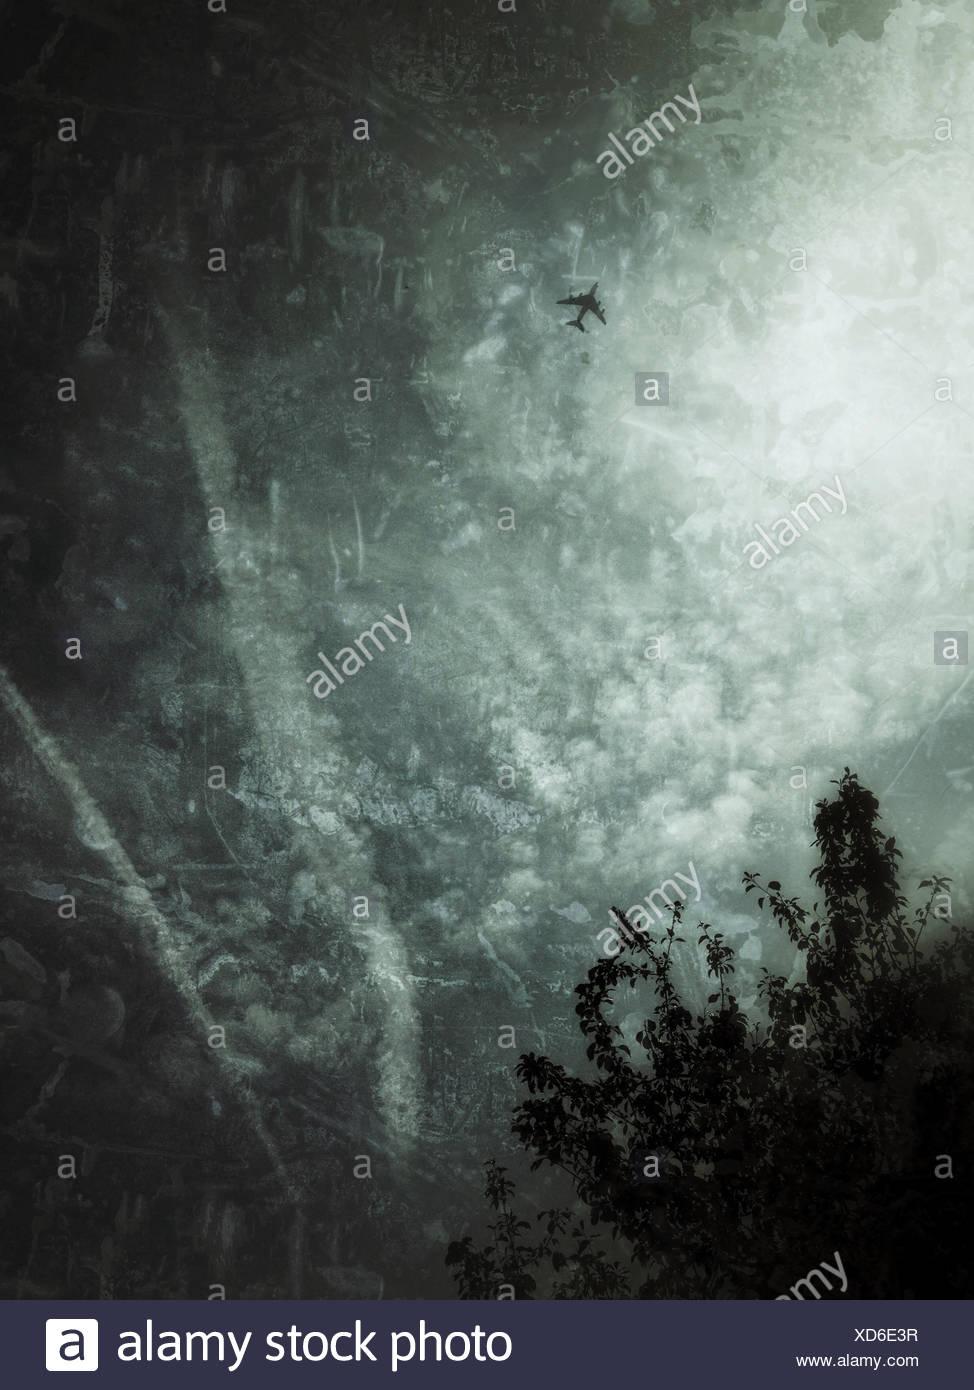 UK, Londres, vol d'un avion par moody skies Photo Stock